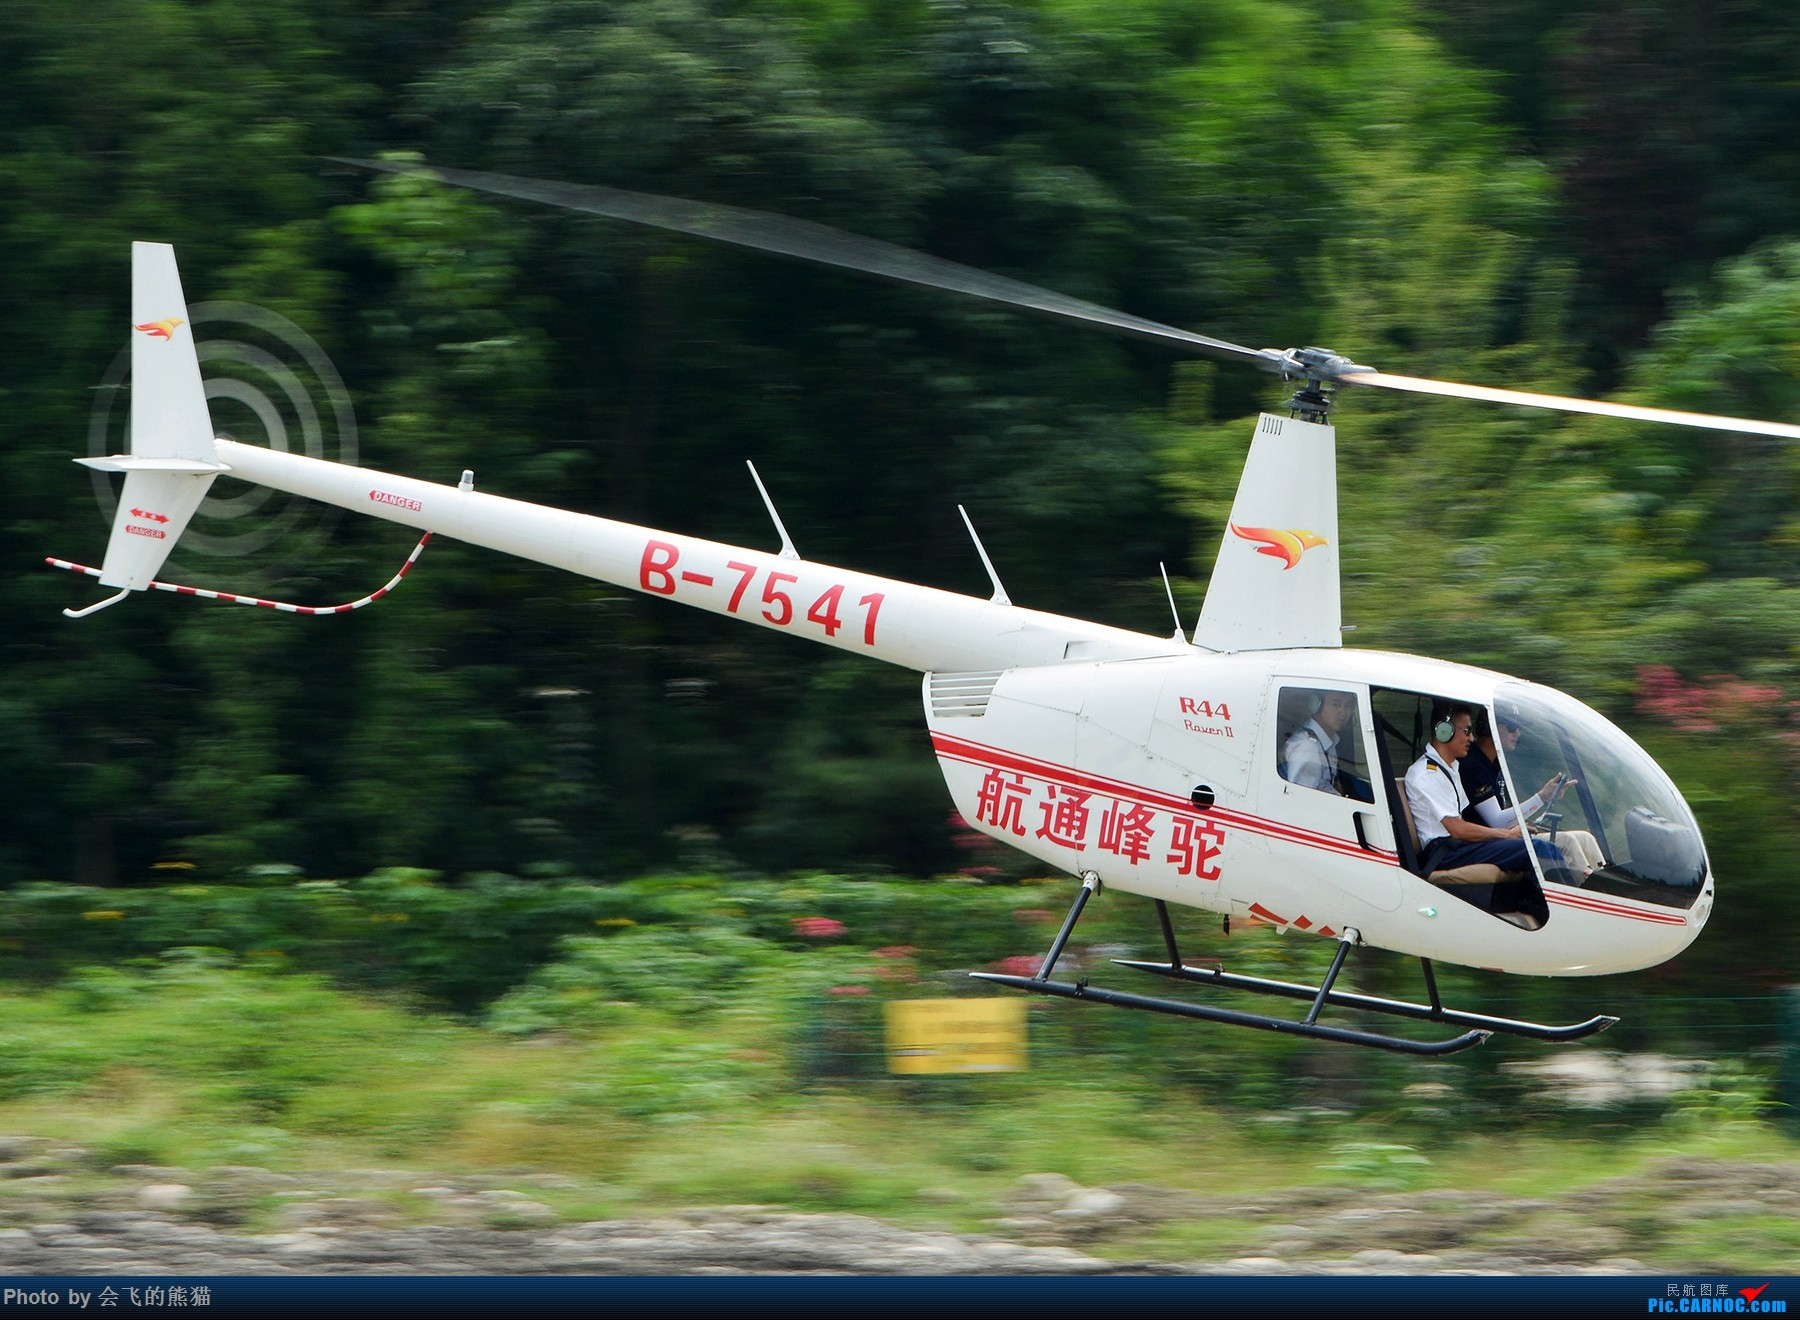 Re:[原创]开心就好 ROBINSON R44 II B-7541 青城山机场